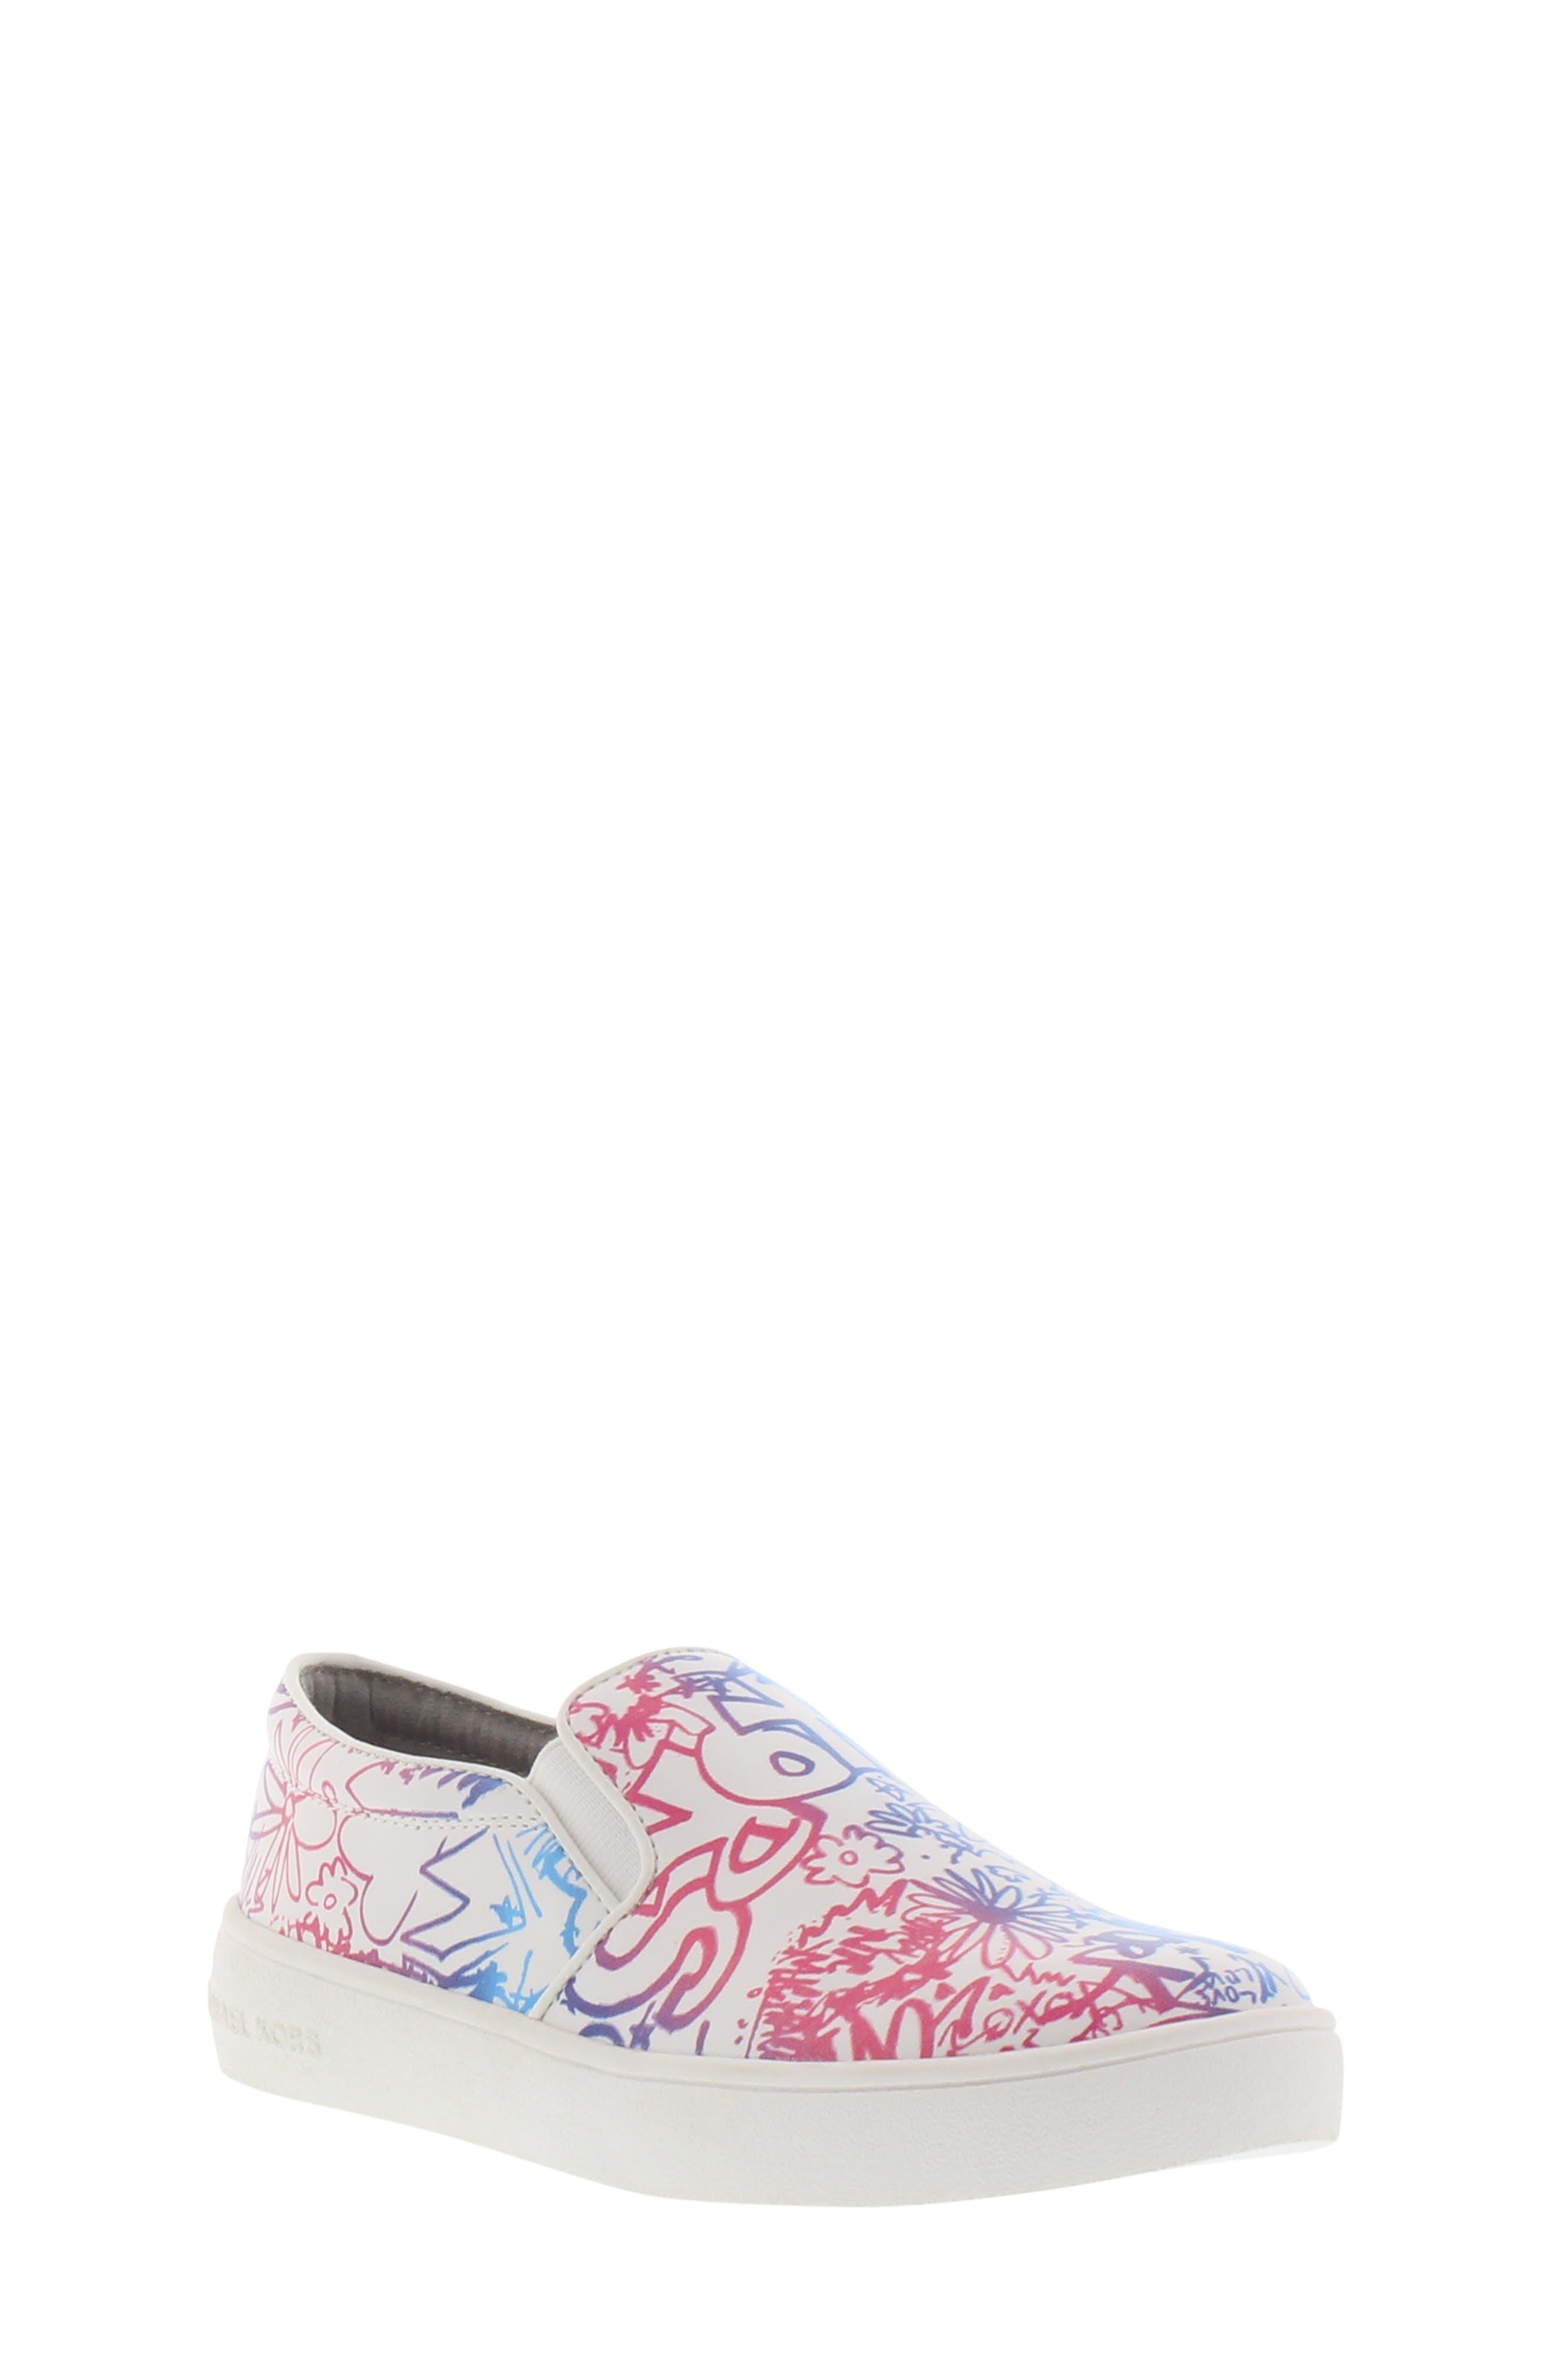 Ivy Spectrum Slip-On Sneaker,                         Main,                         color, 165